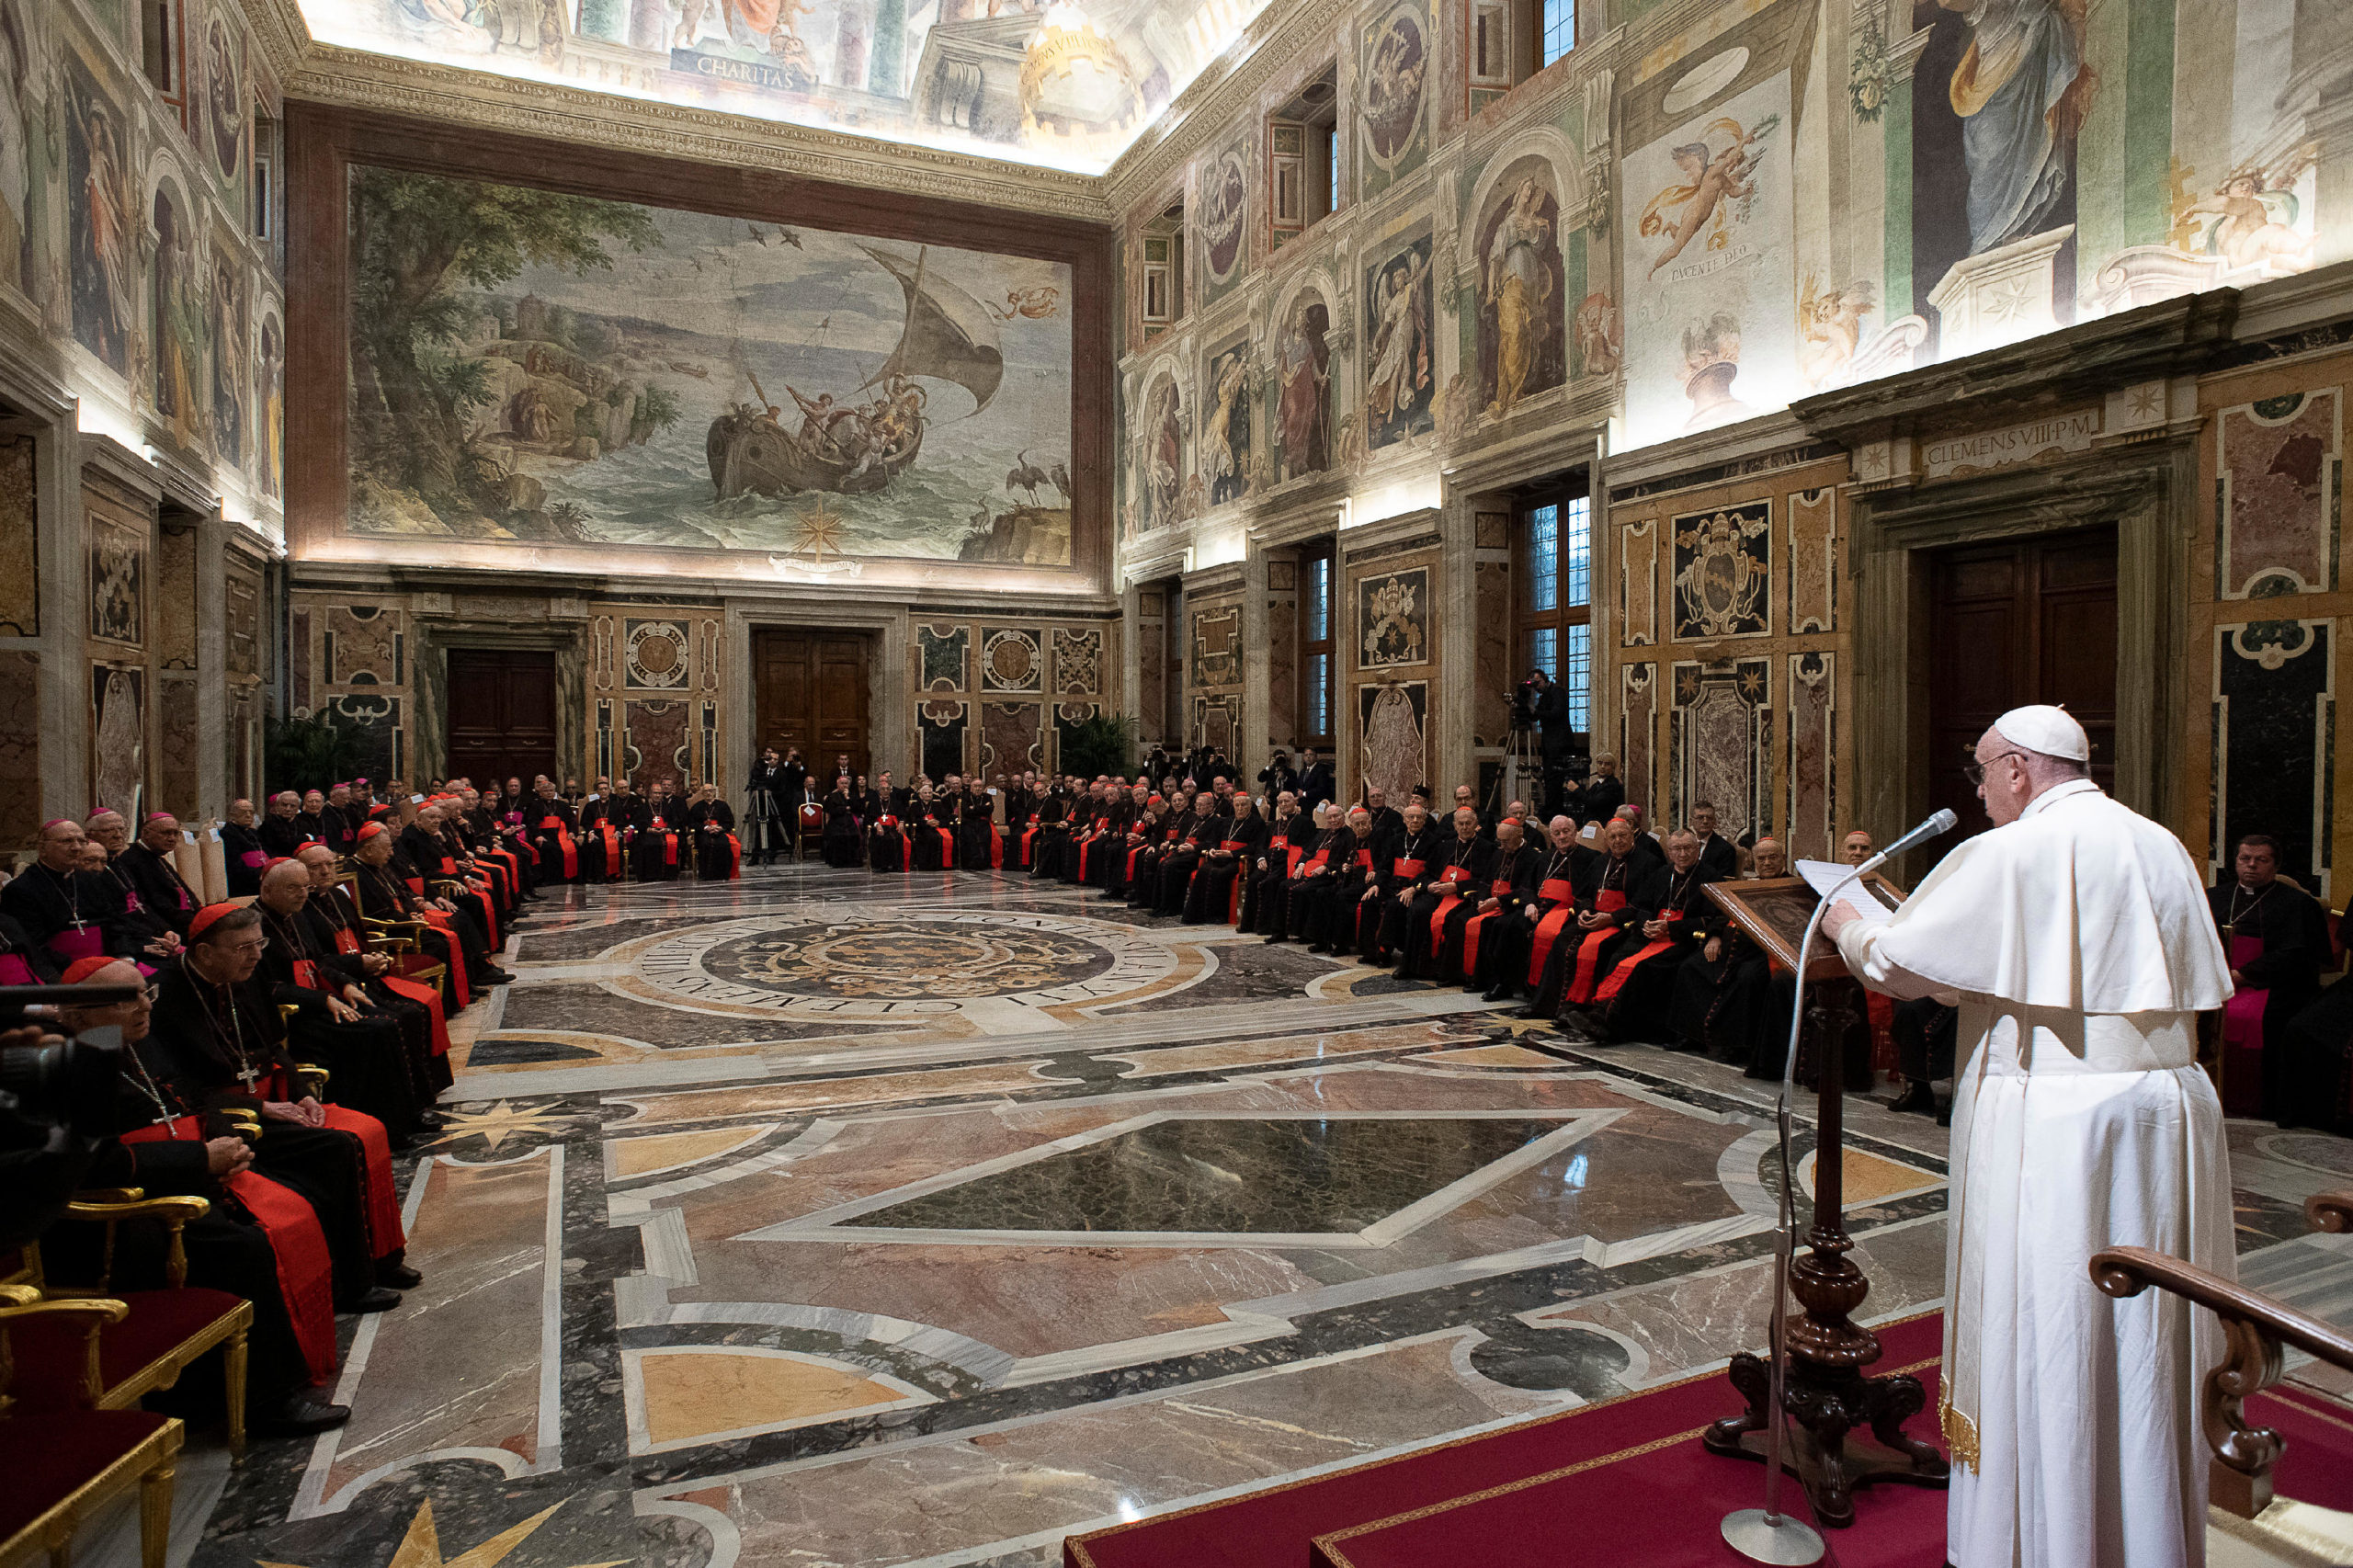 Discurso En La Curia Romana, Navidad 2019 © Vatican Media